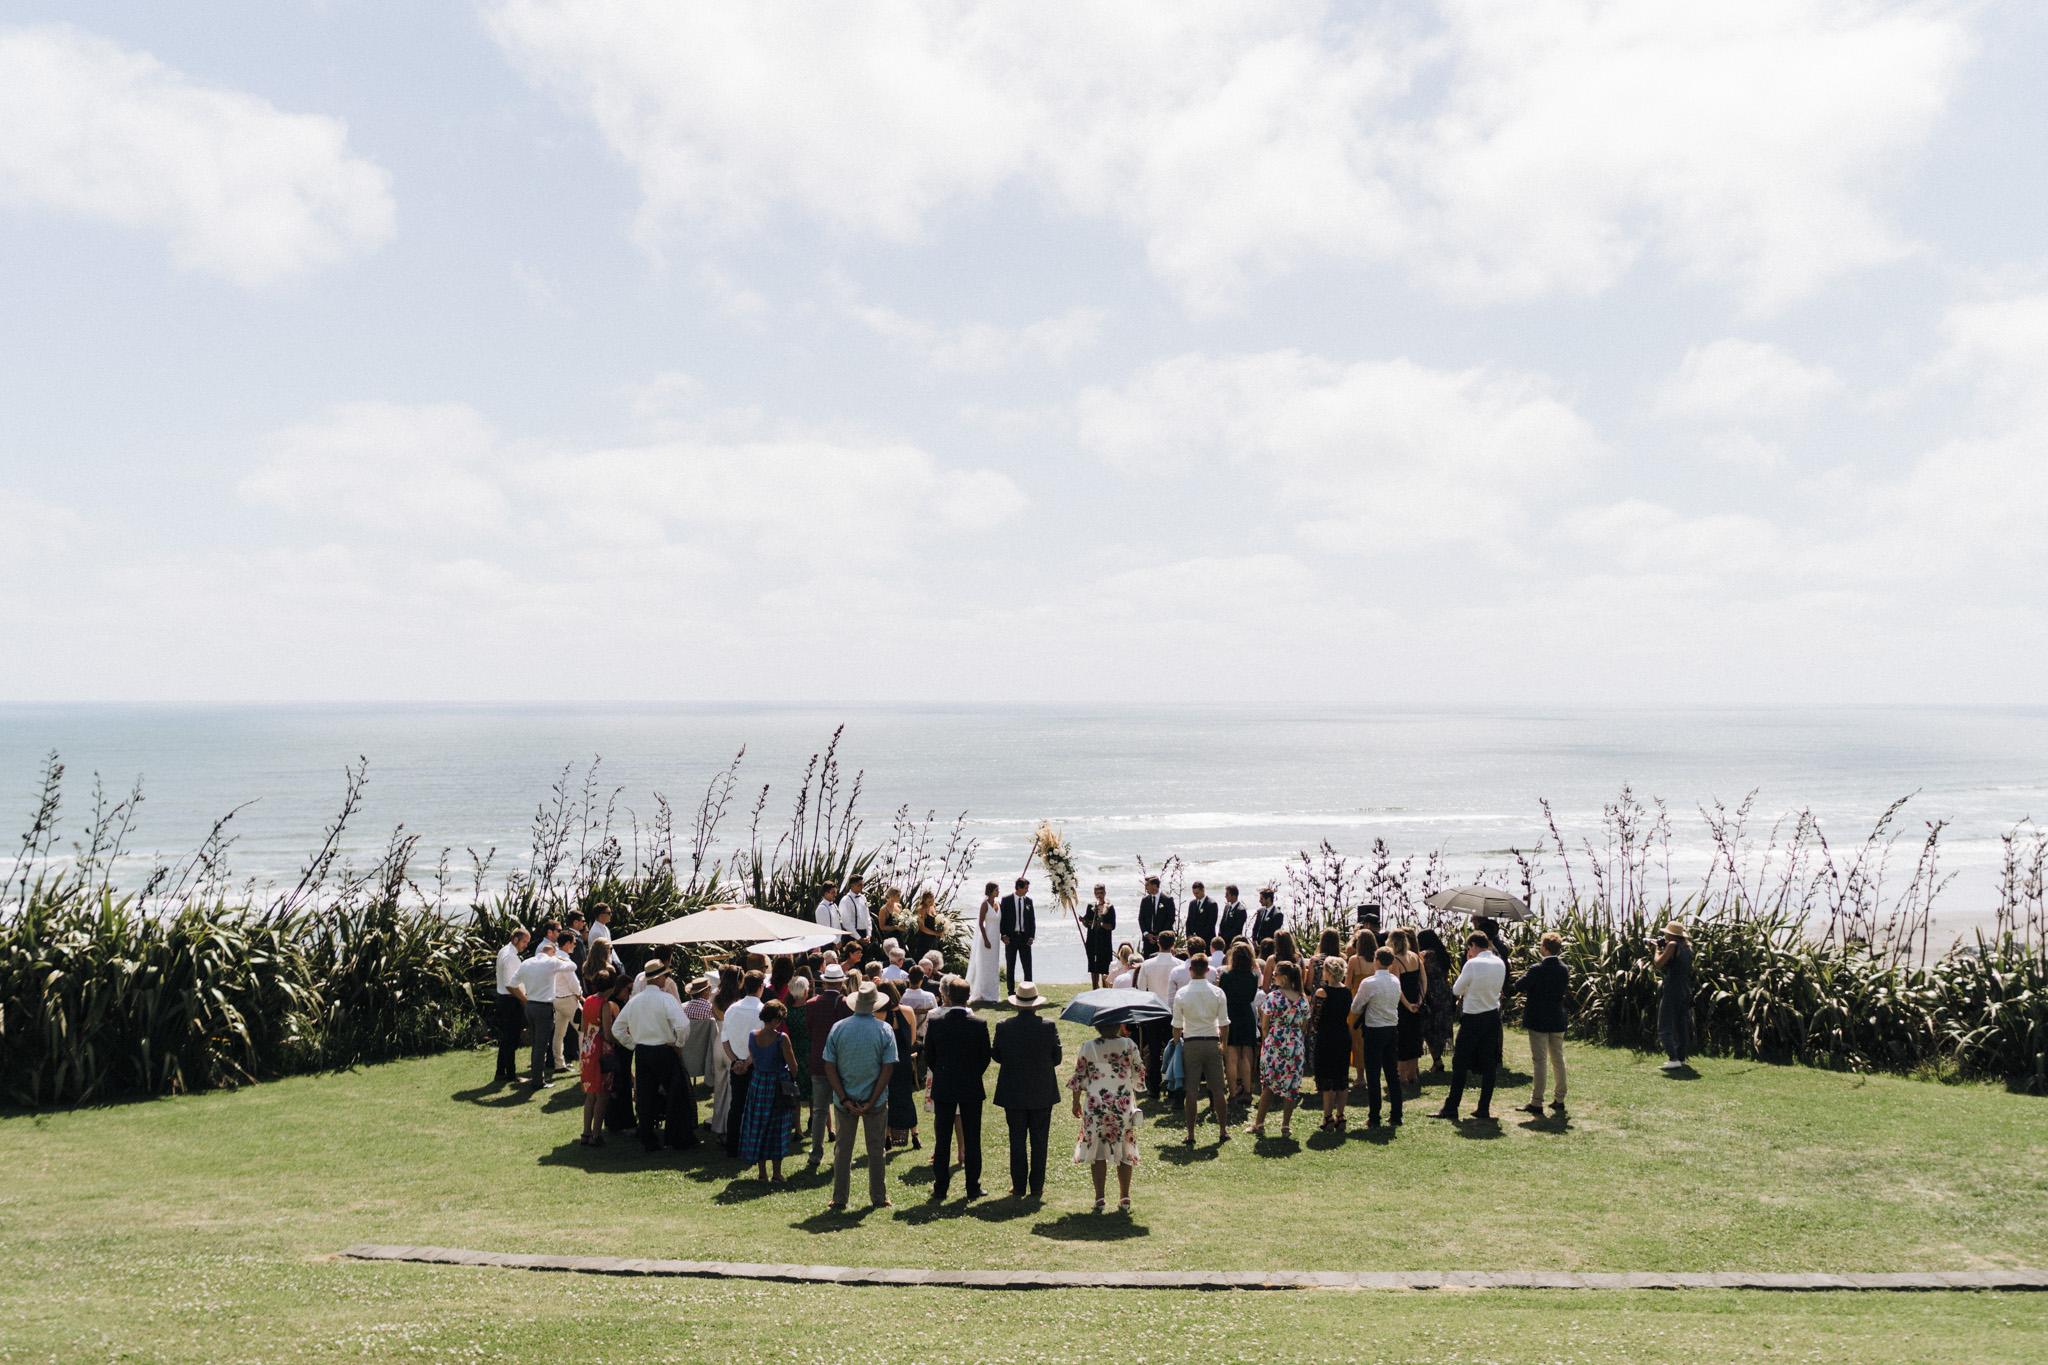 newfound-h-m-castaways-waiuku-auckland-wedding-photographer-114